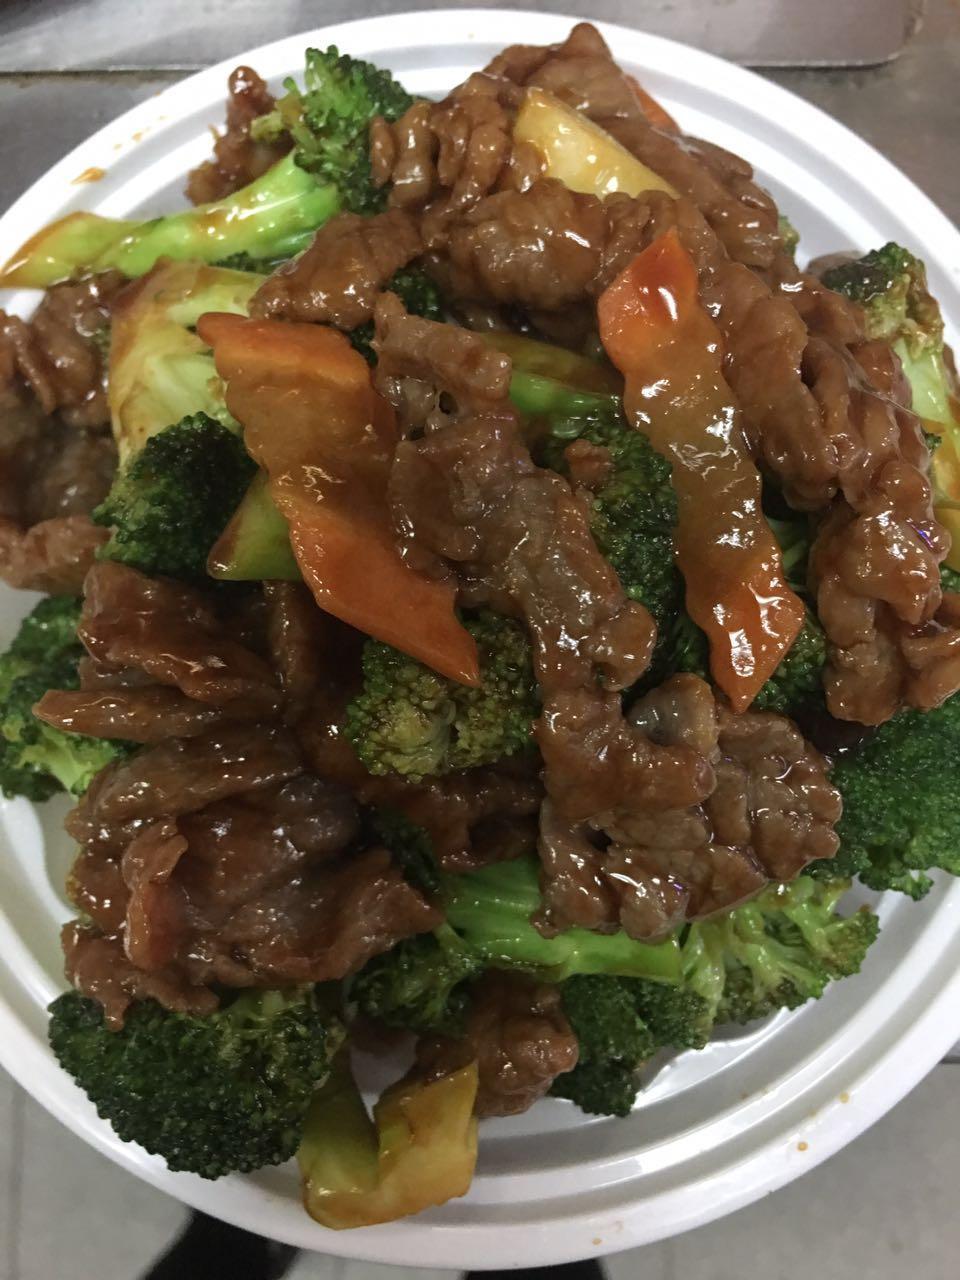 89. Beef w. Broccoli Image